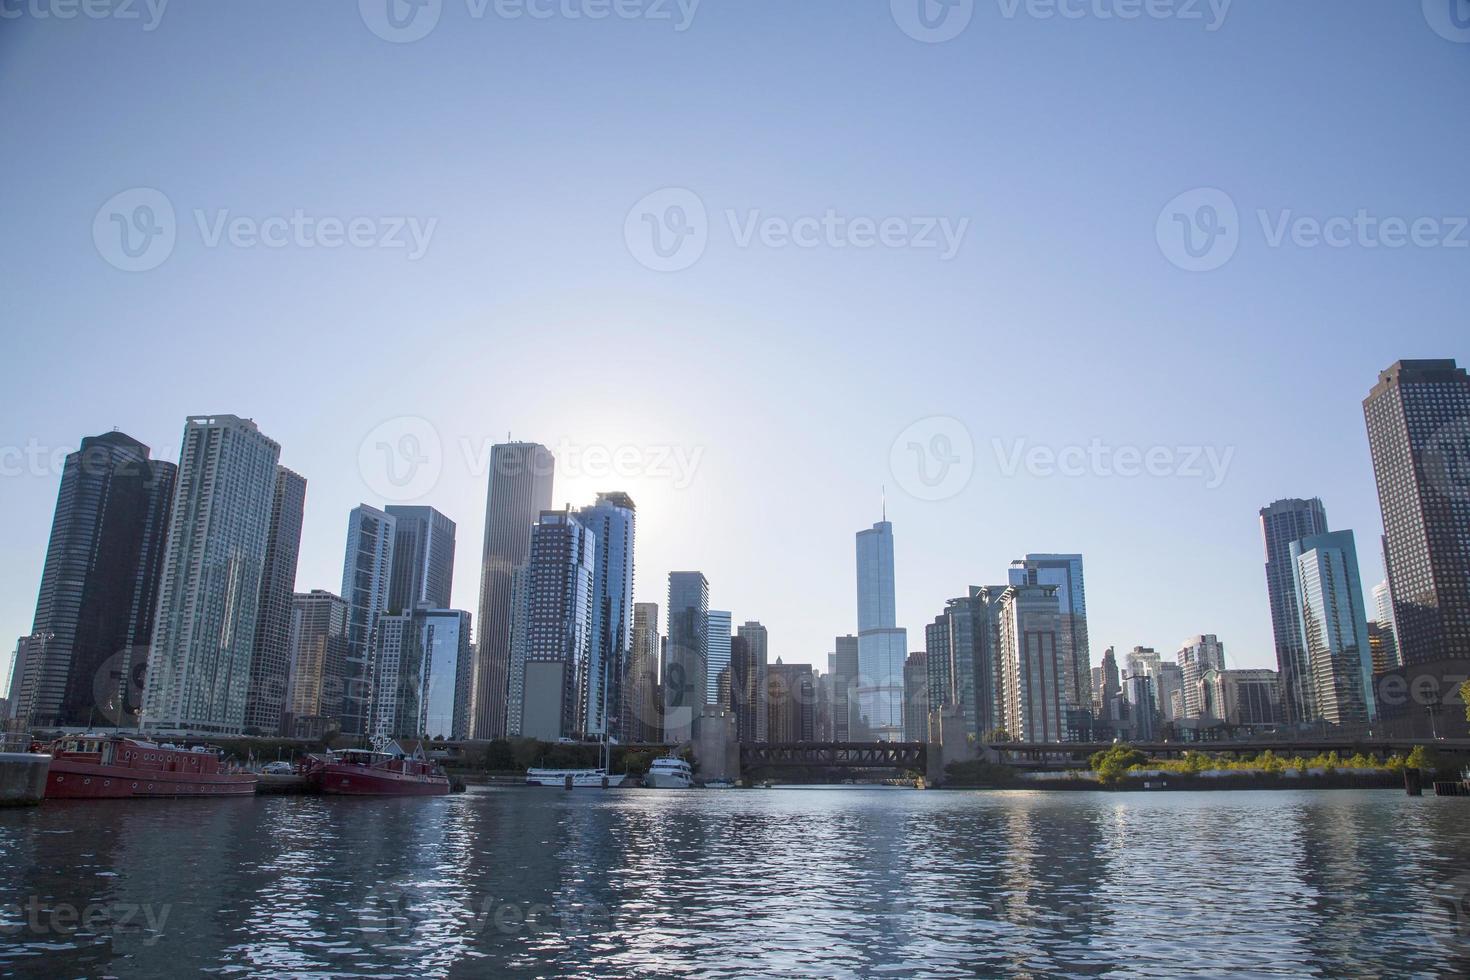 USA - Illinois - Chicago, skyline photo